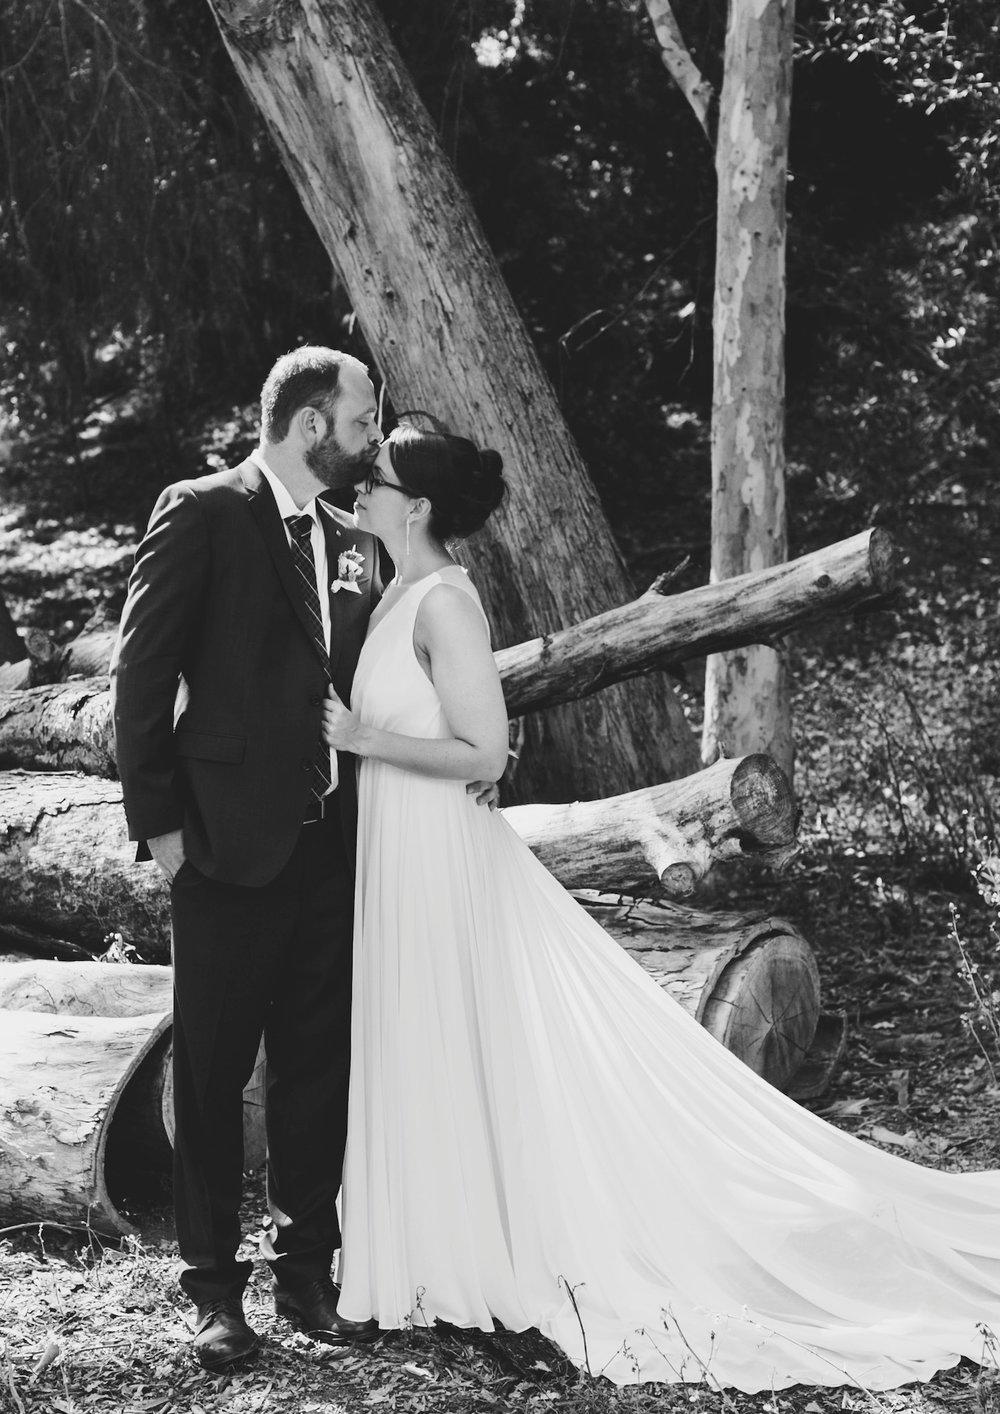 Christine + Wade on their wedding day. Photo by  Kathy DeNinno.